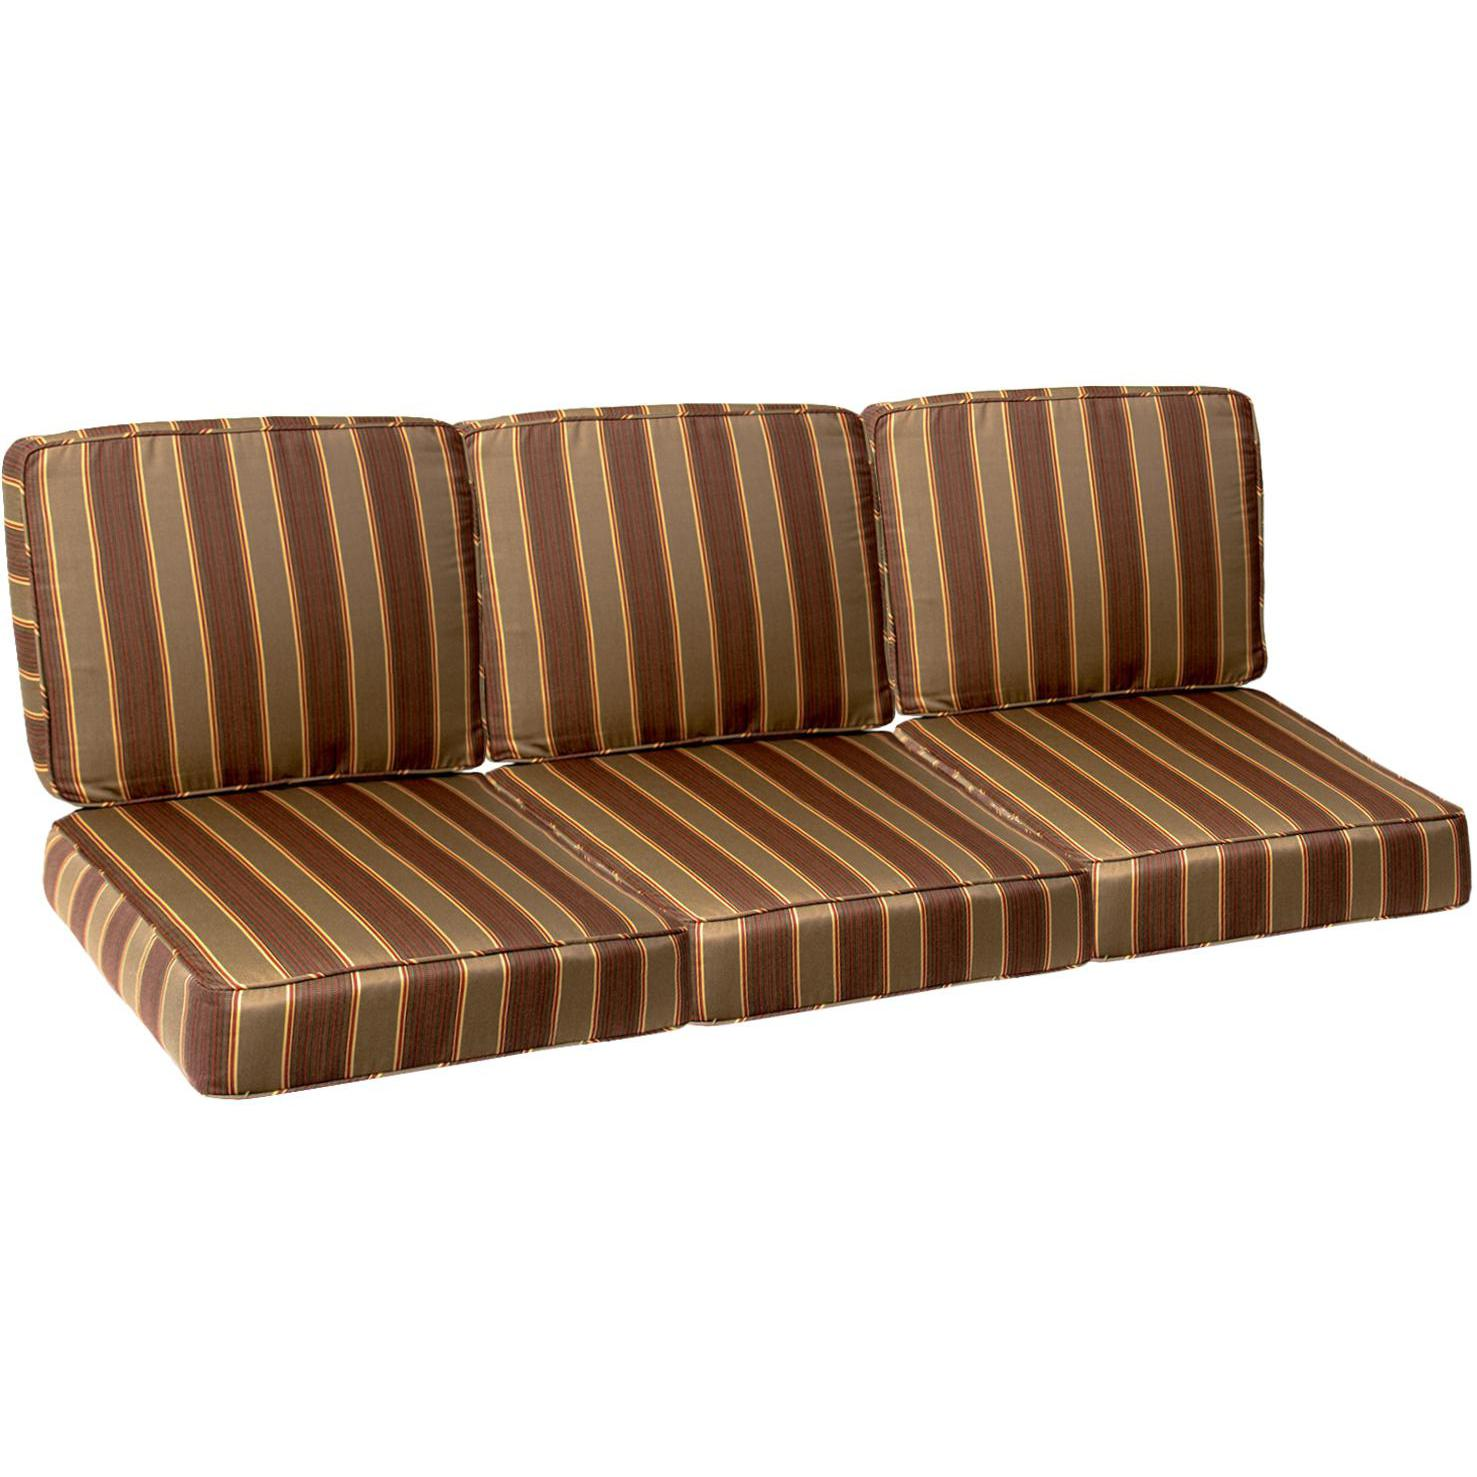 amazon sofa set 5 seater rent a sydney easy shop darlee catalina cast aluminum deep seating